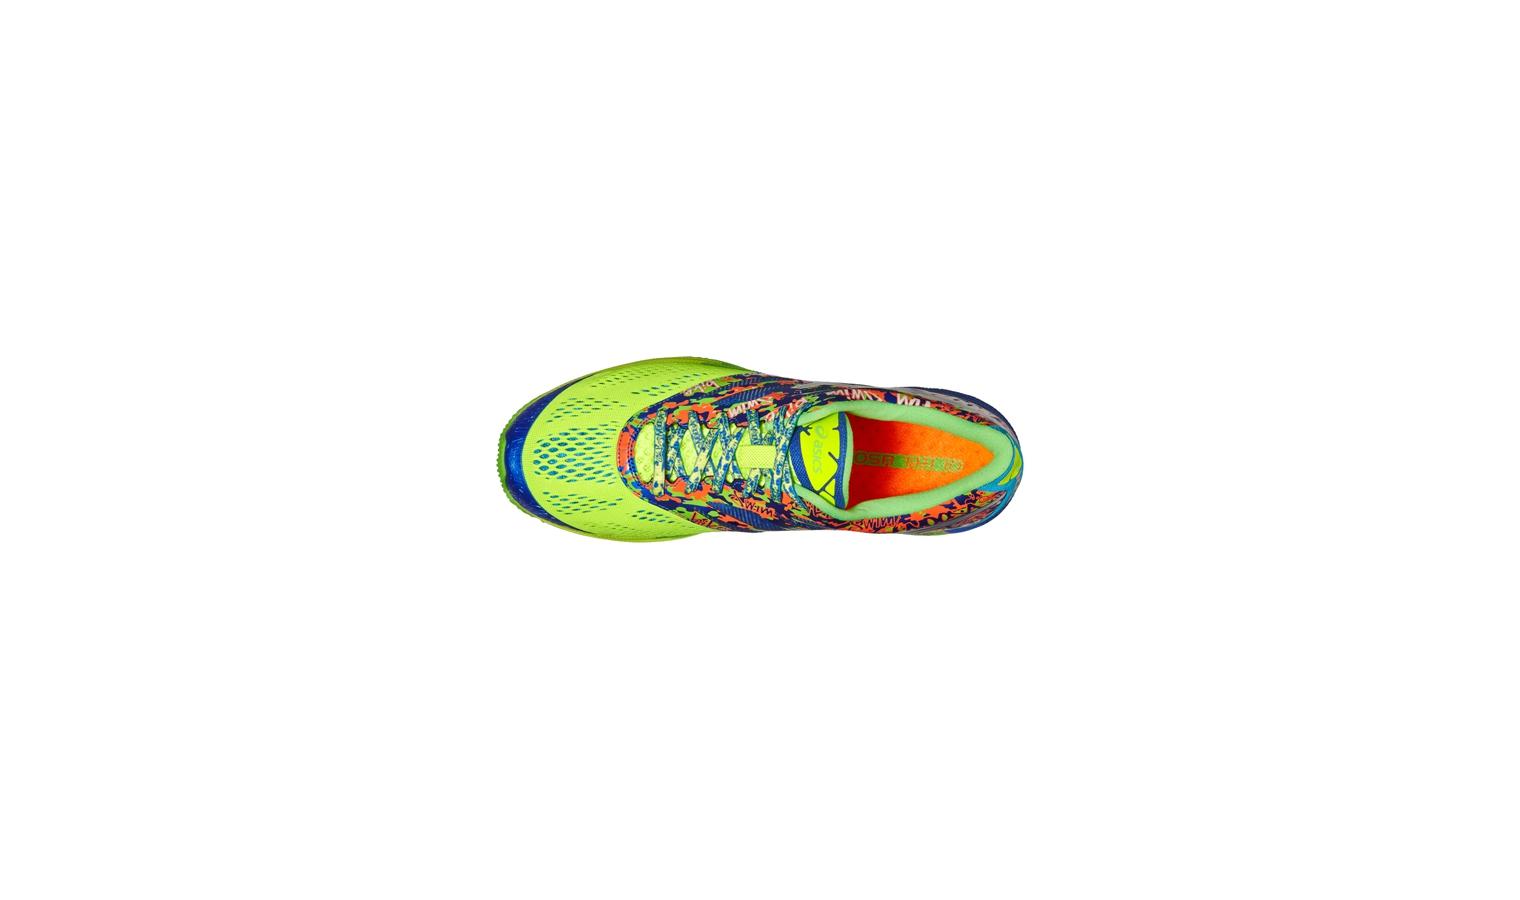 01fd70d31ba Pánske bežecké topánky Asics GEL-NOOSA TRI 10 žlté   modré   sivé ...